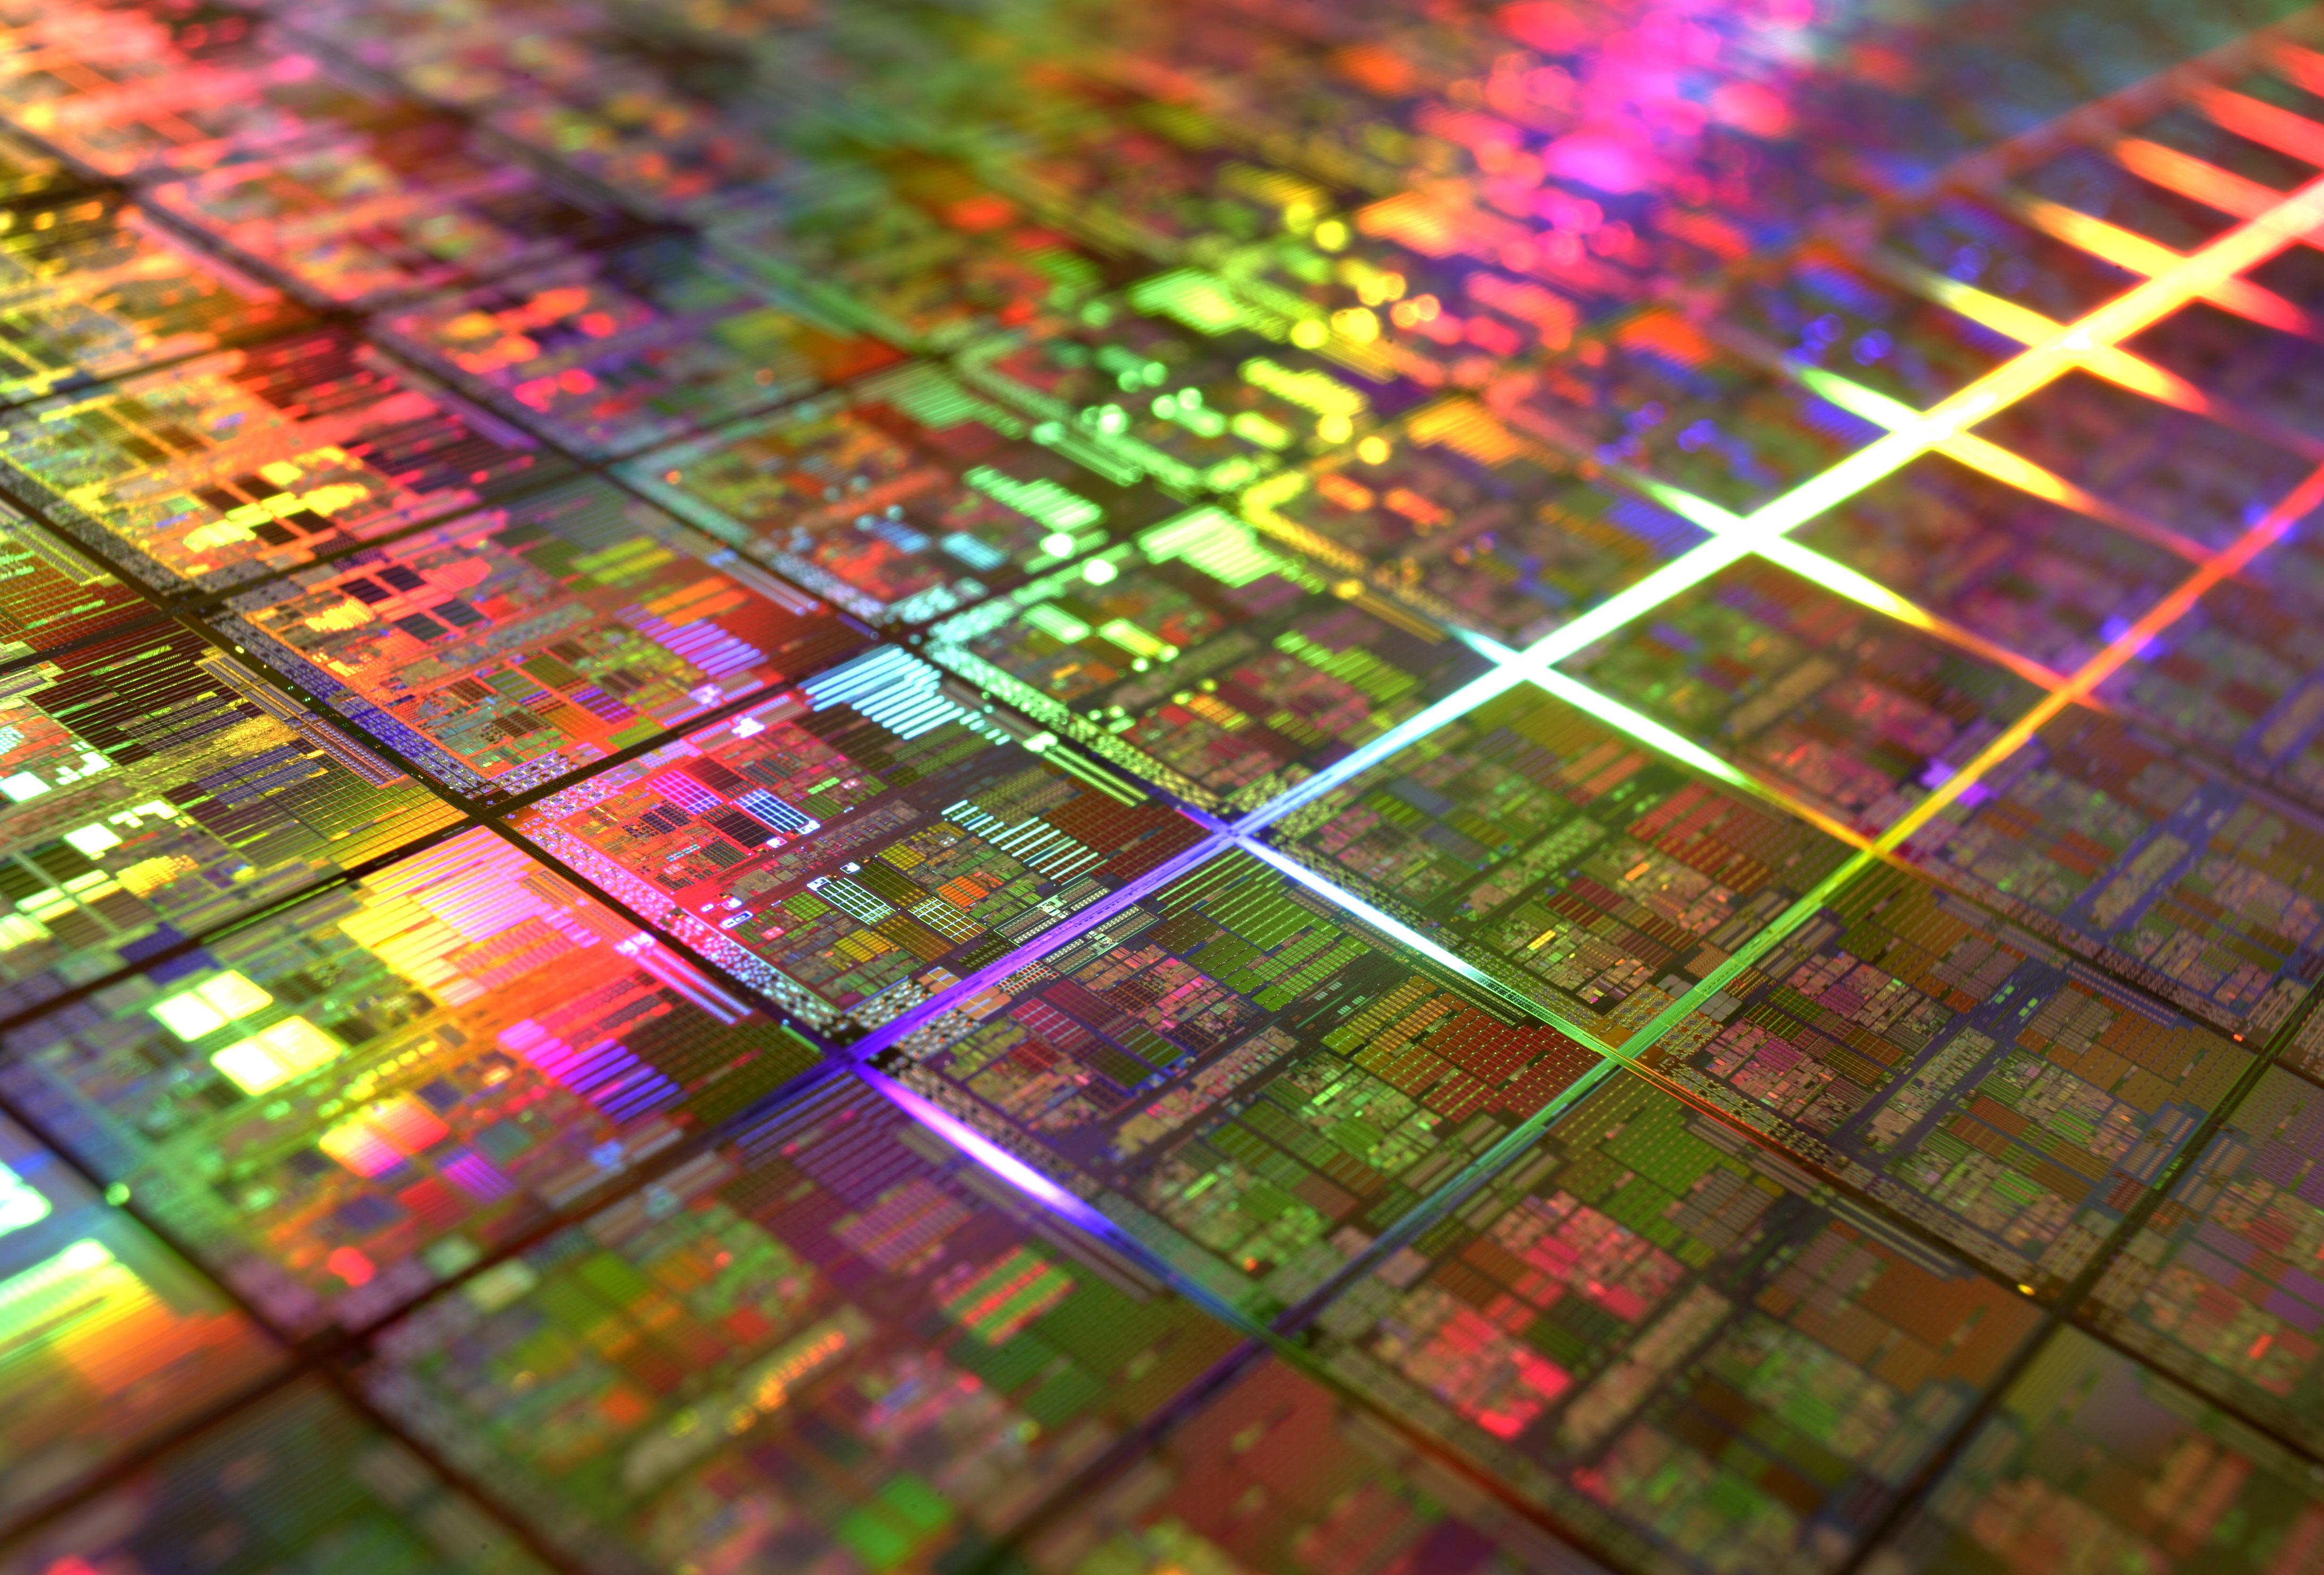 4K wallpaper   Hi tech   chip circuit board   4380x2968 4380x2968